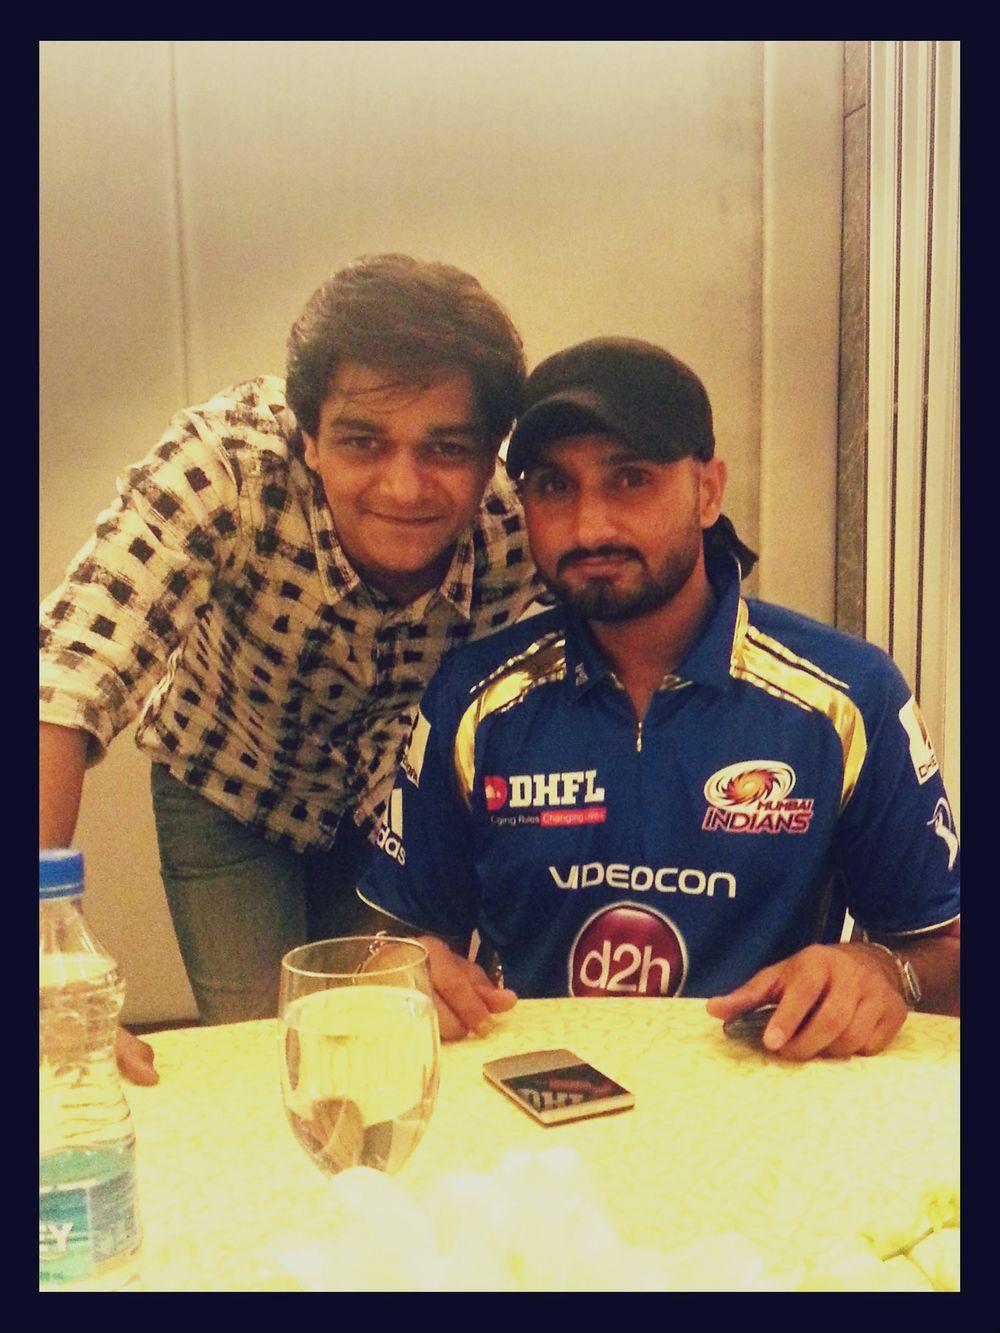 Photo From IPL 2013 - By DJ Ravish